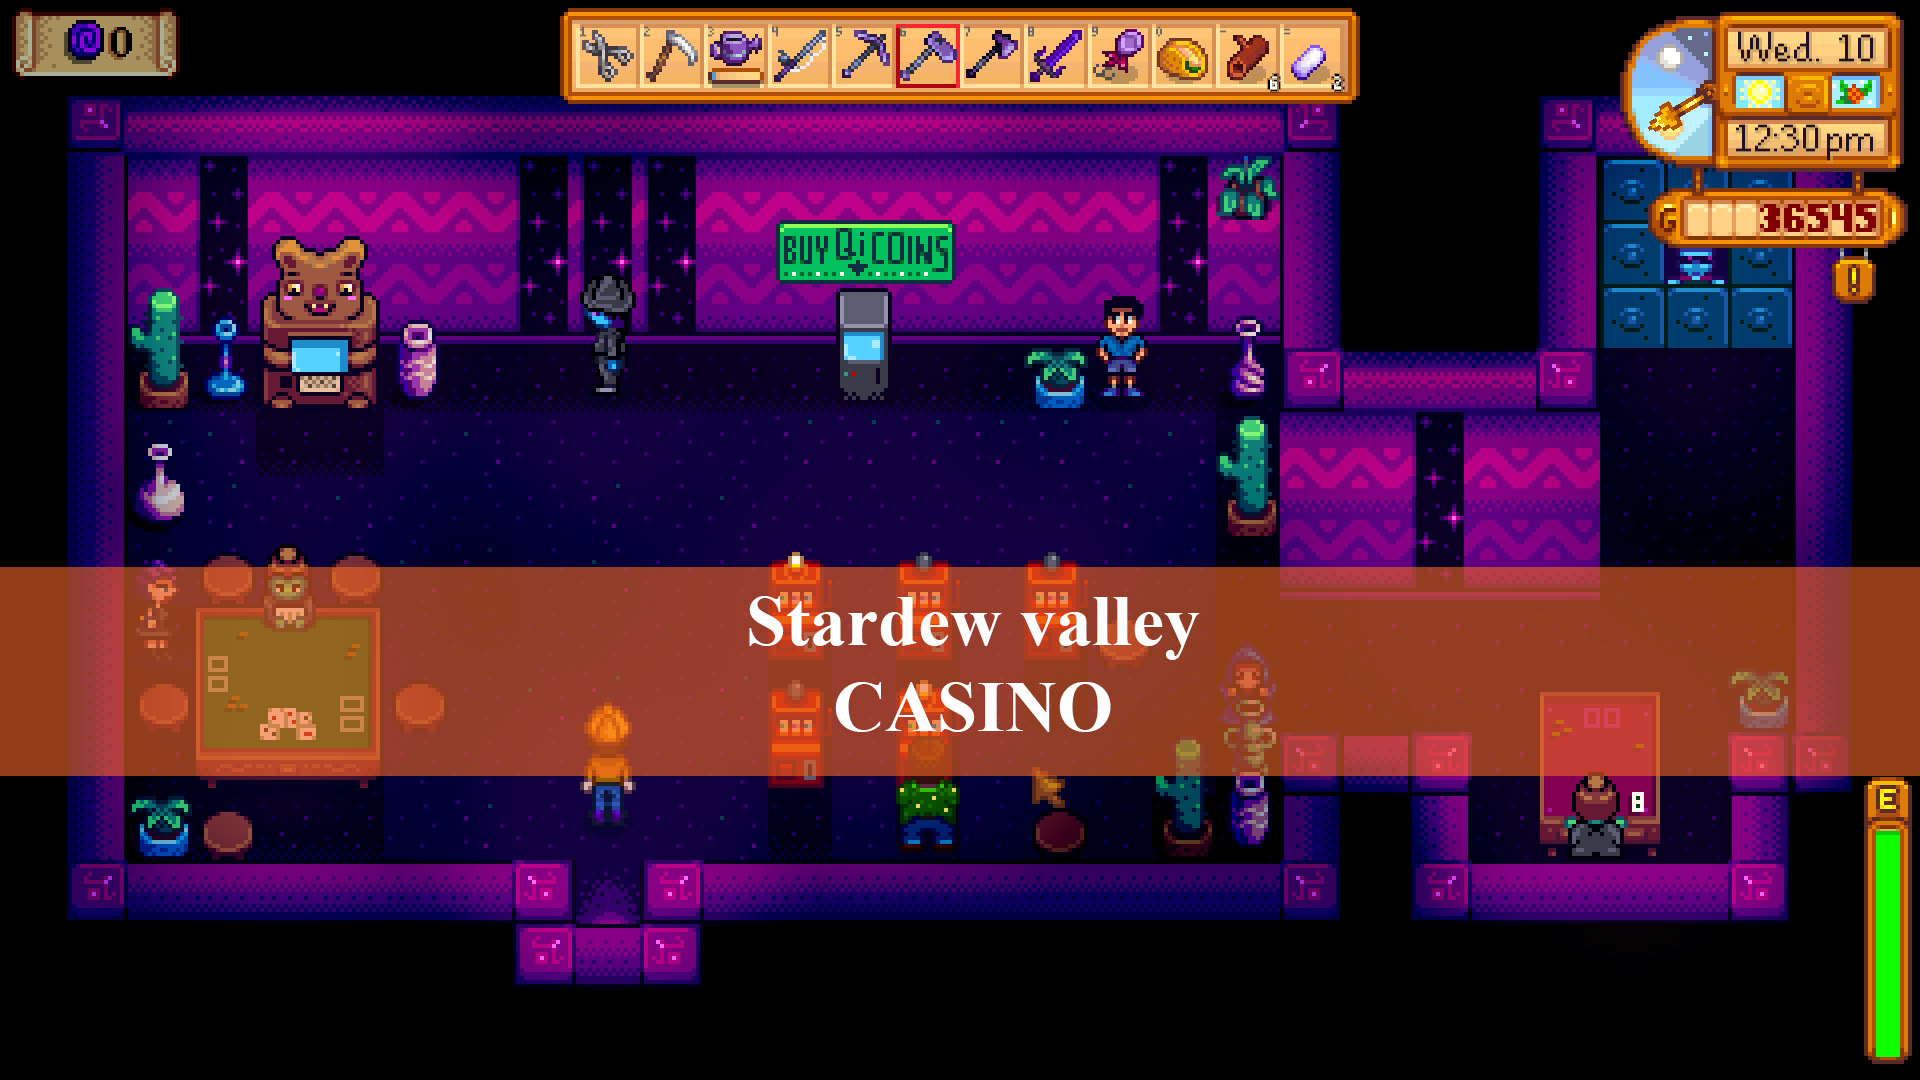 Casino Stardew Valley